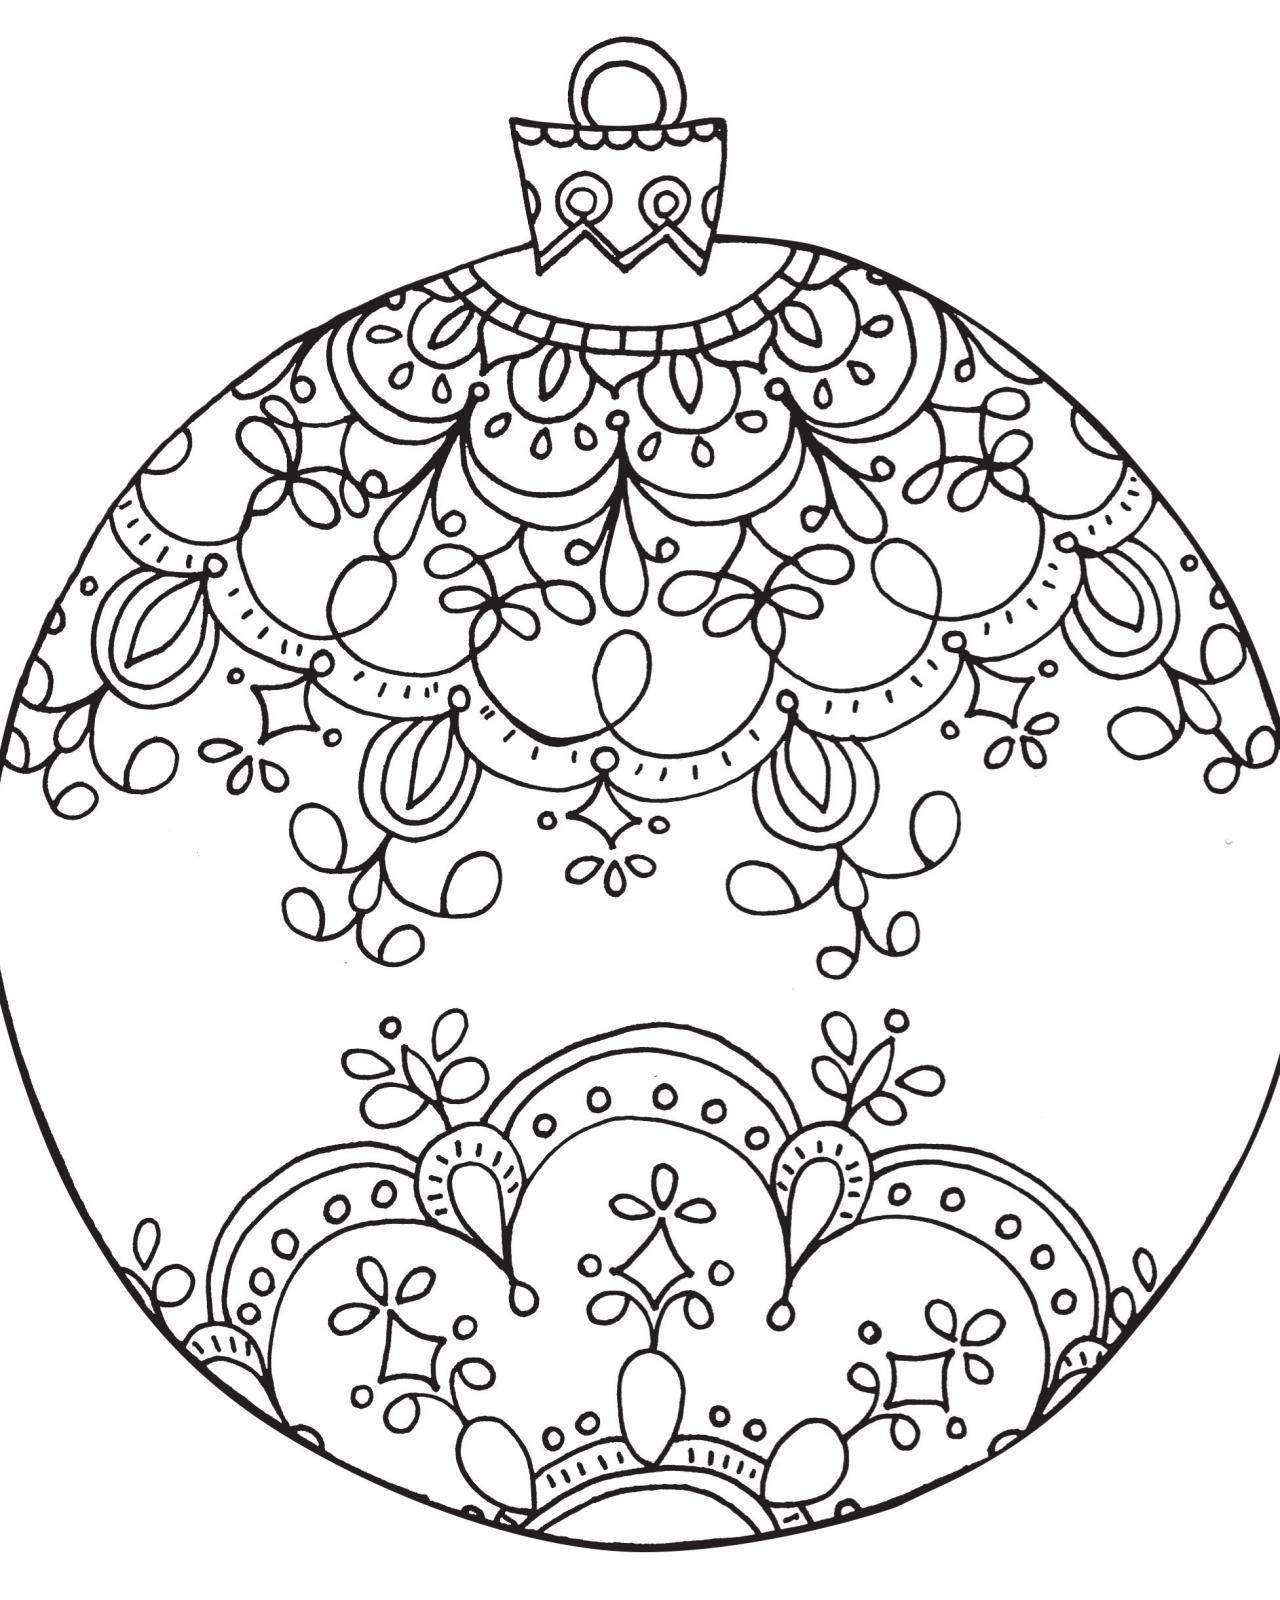 Christmas Mandala Coloring Pages Printable Download Printable Christmas Coloring Pages Christmas Coloring Books Free Christmas Coloring Pages